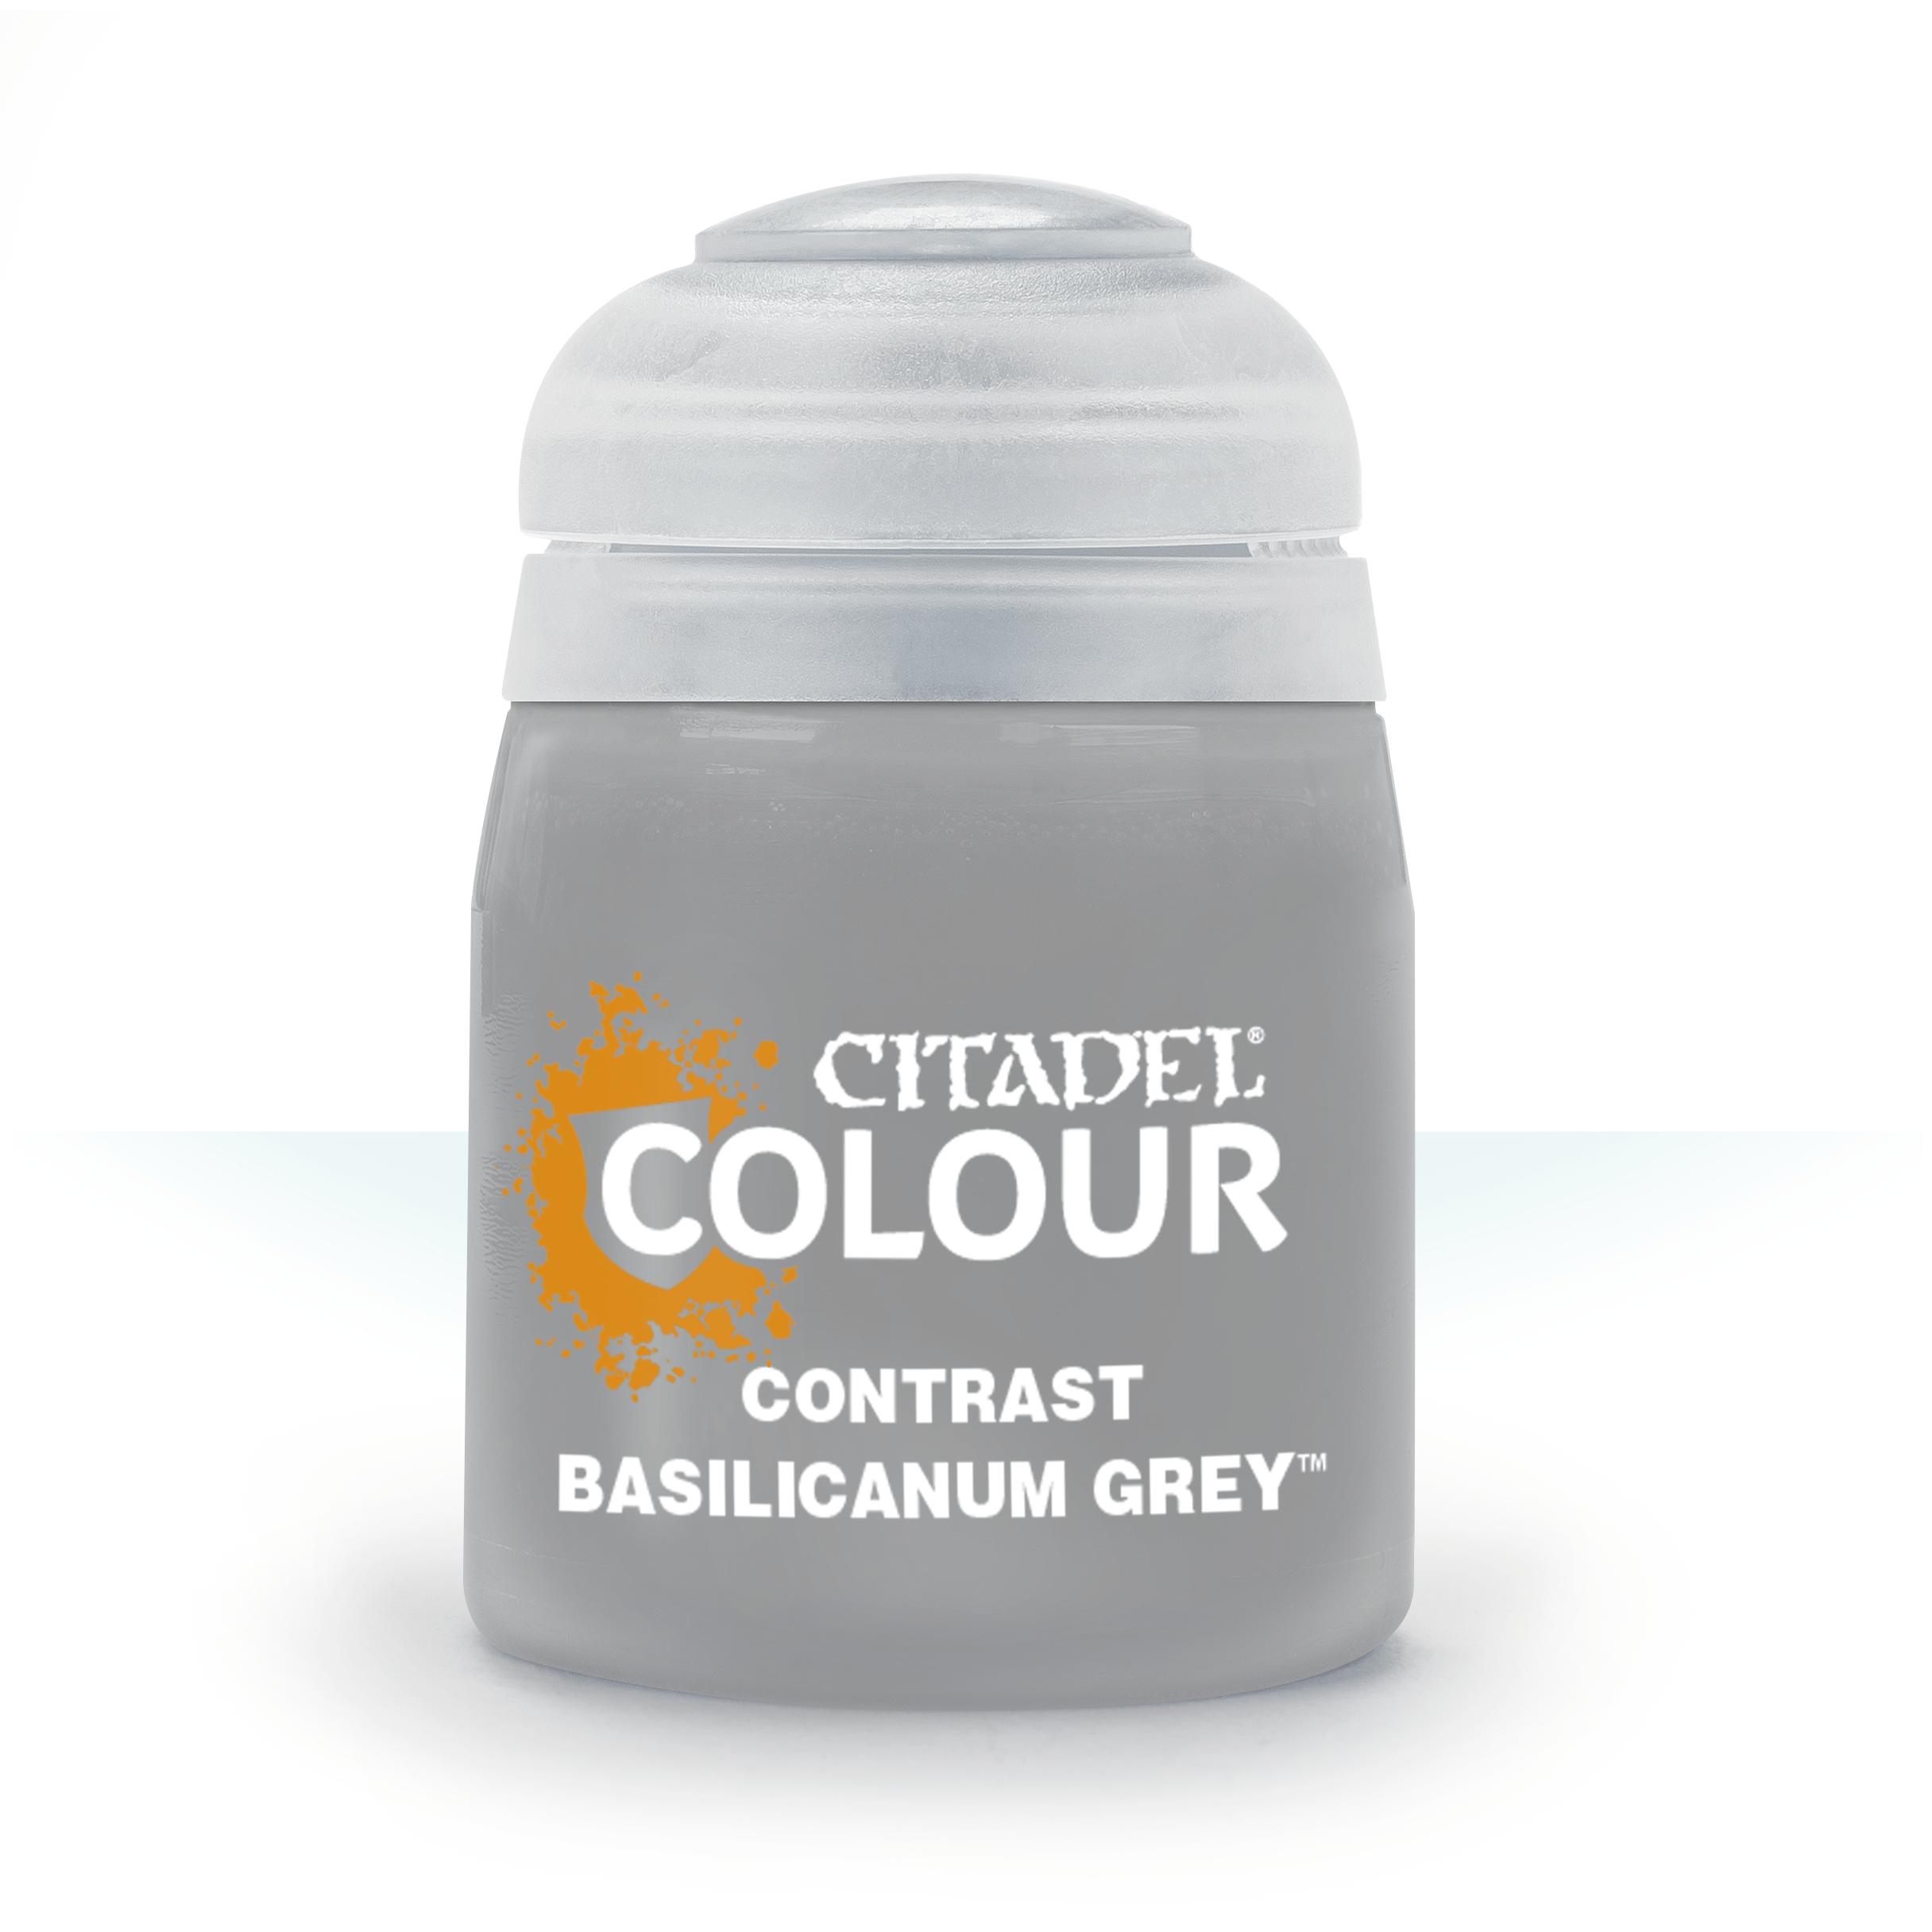 29-37 Contrast Basilicanum Grey 18ml